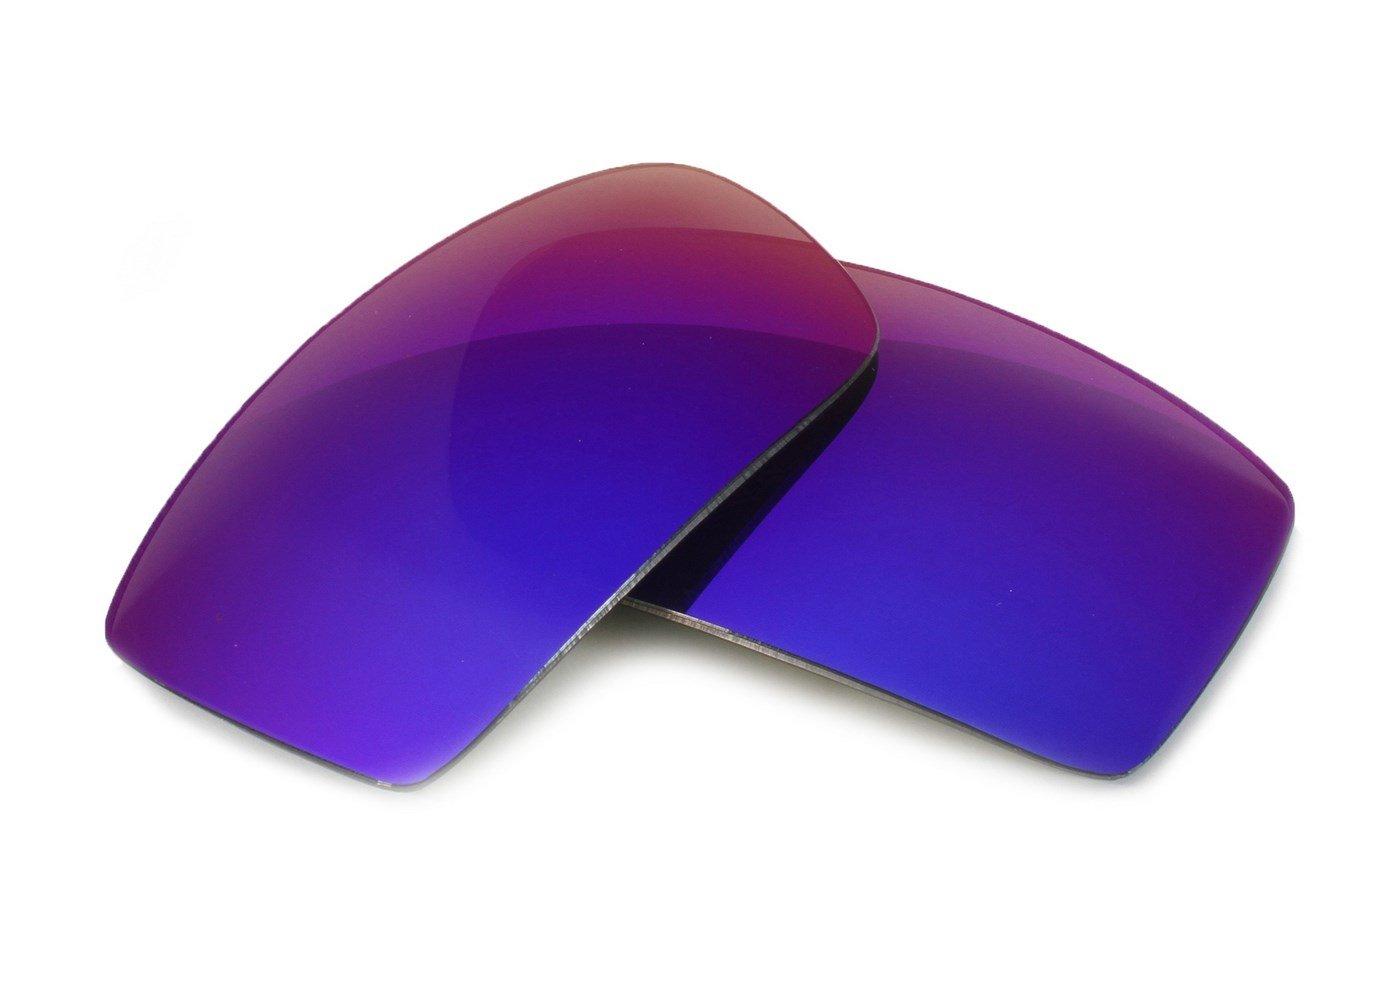 Fuse Lenses for Costa Del Mar Zane - Cosmic Mirror Tint